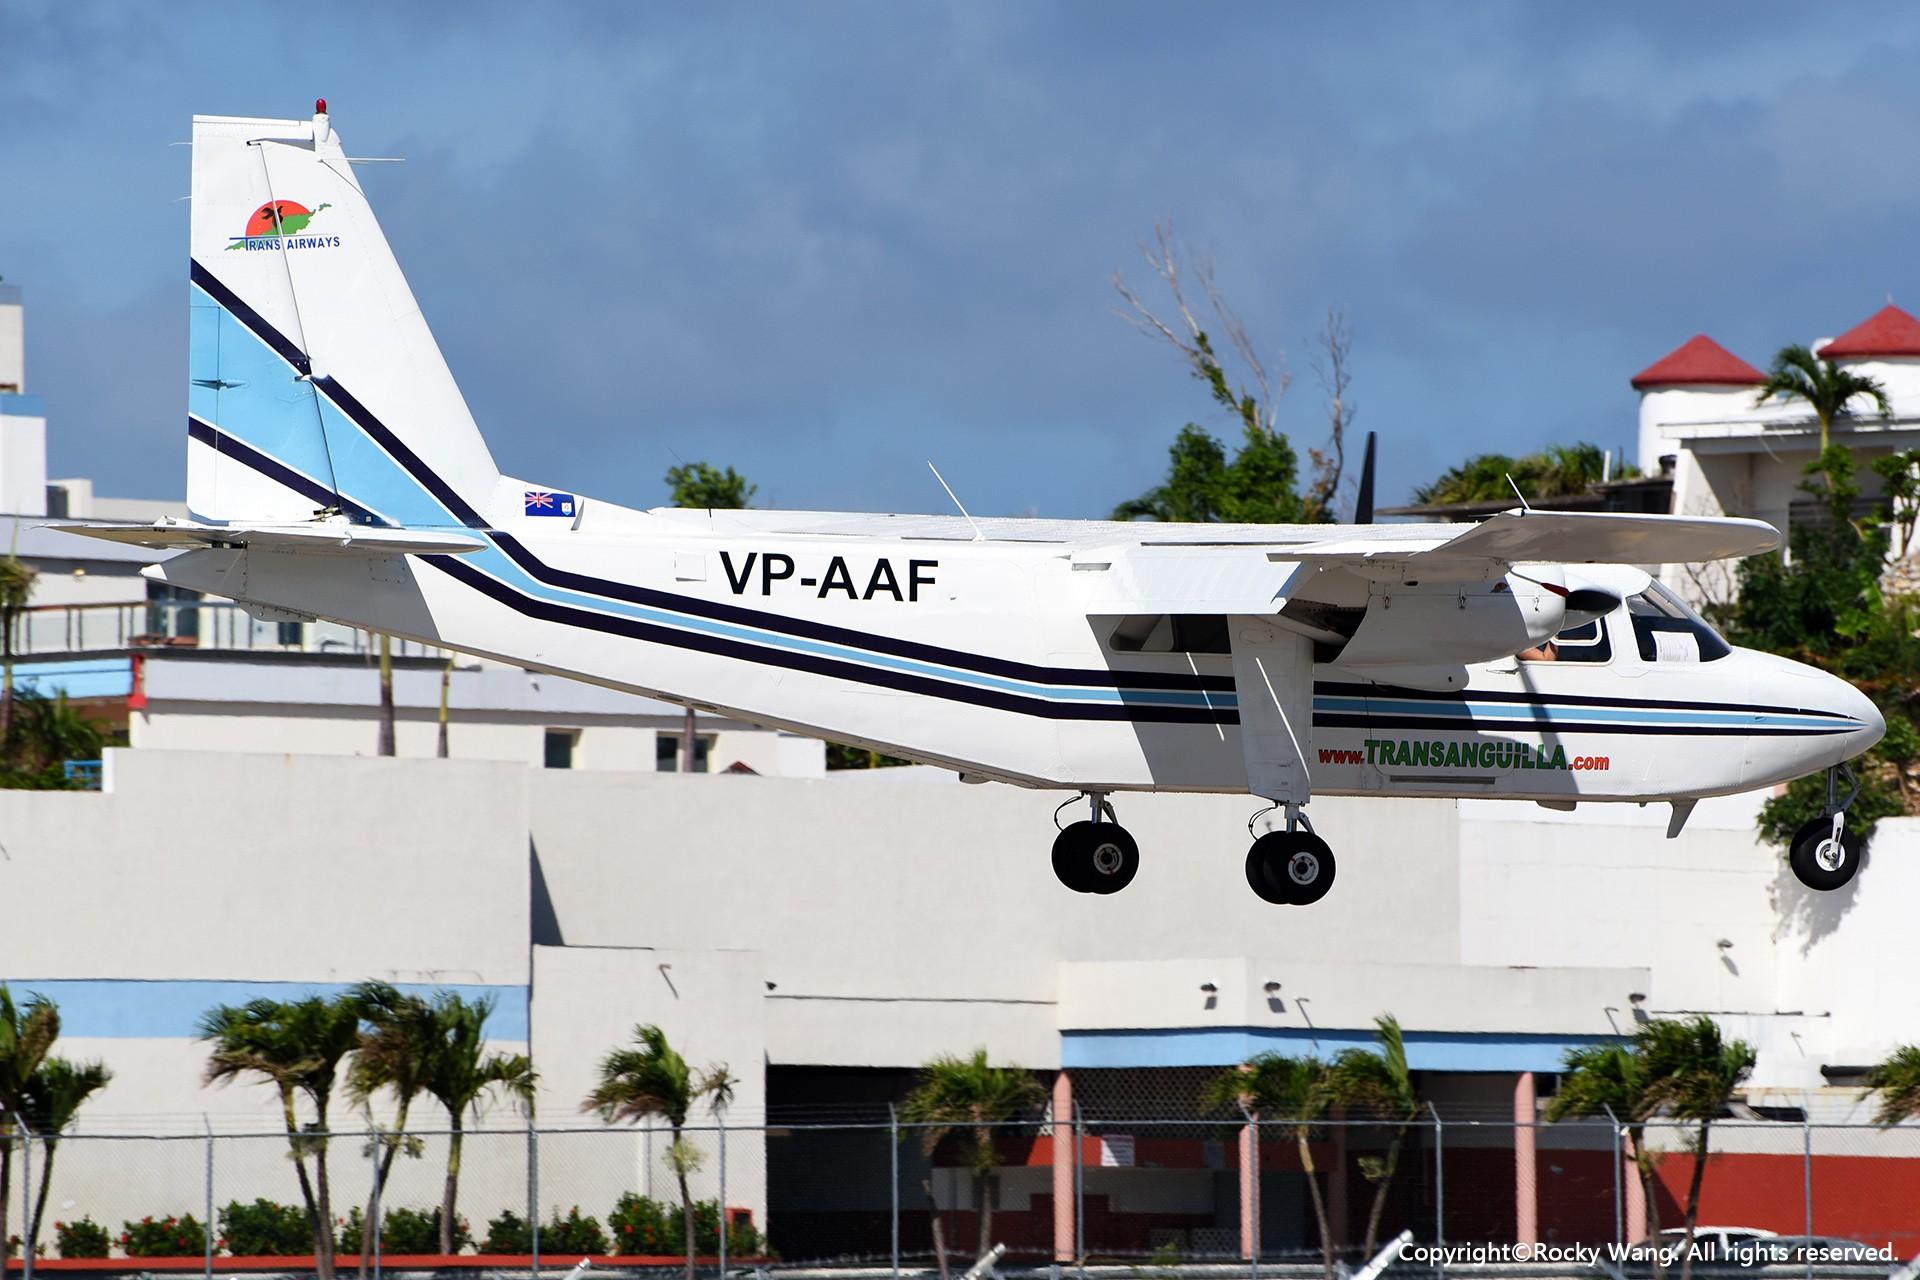 Re:[原创]My endless Caribbean dream——圣马丁朱莉安娜公主机场拍机记 BRITTEN-NORMAN BN-2B-21 ISLANDER VP-AAF 荷属安的列斯群岛朱利安娜公主机场